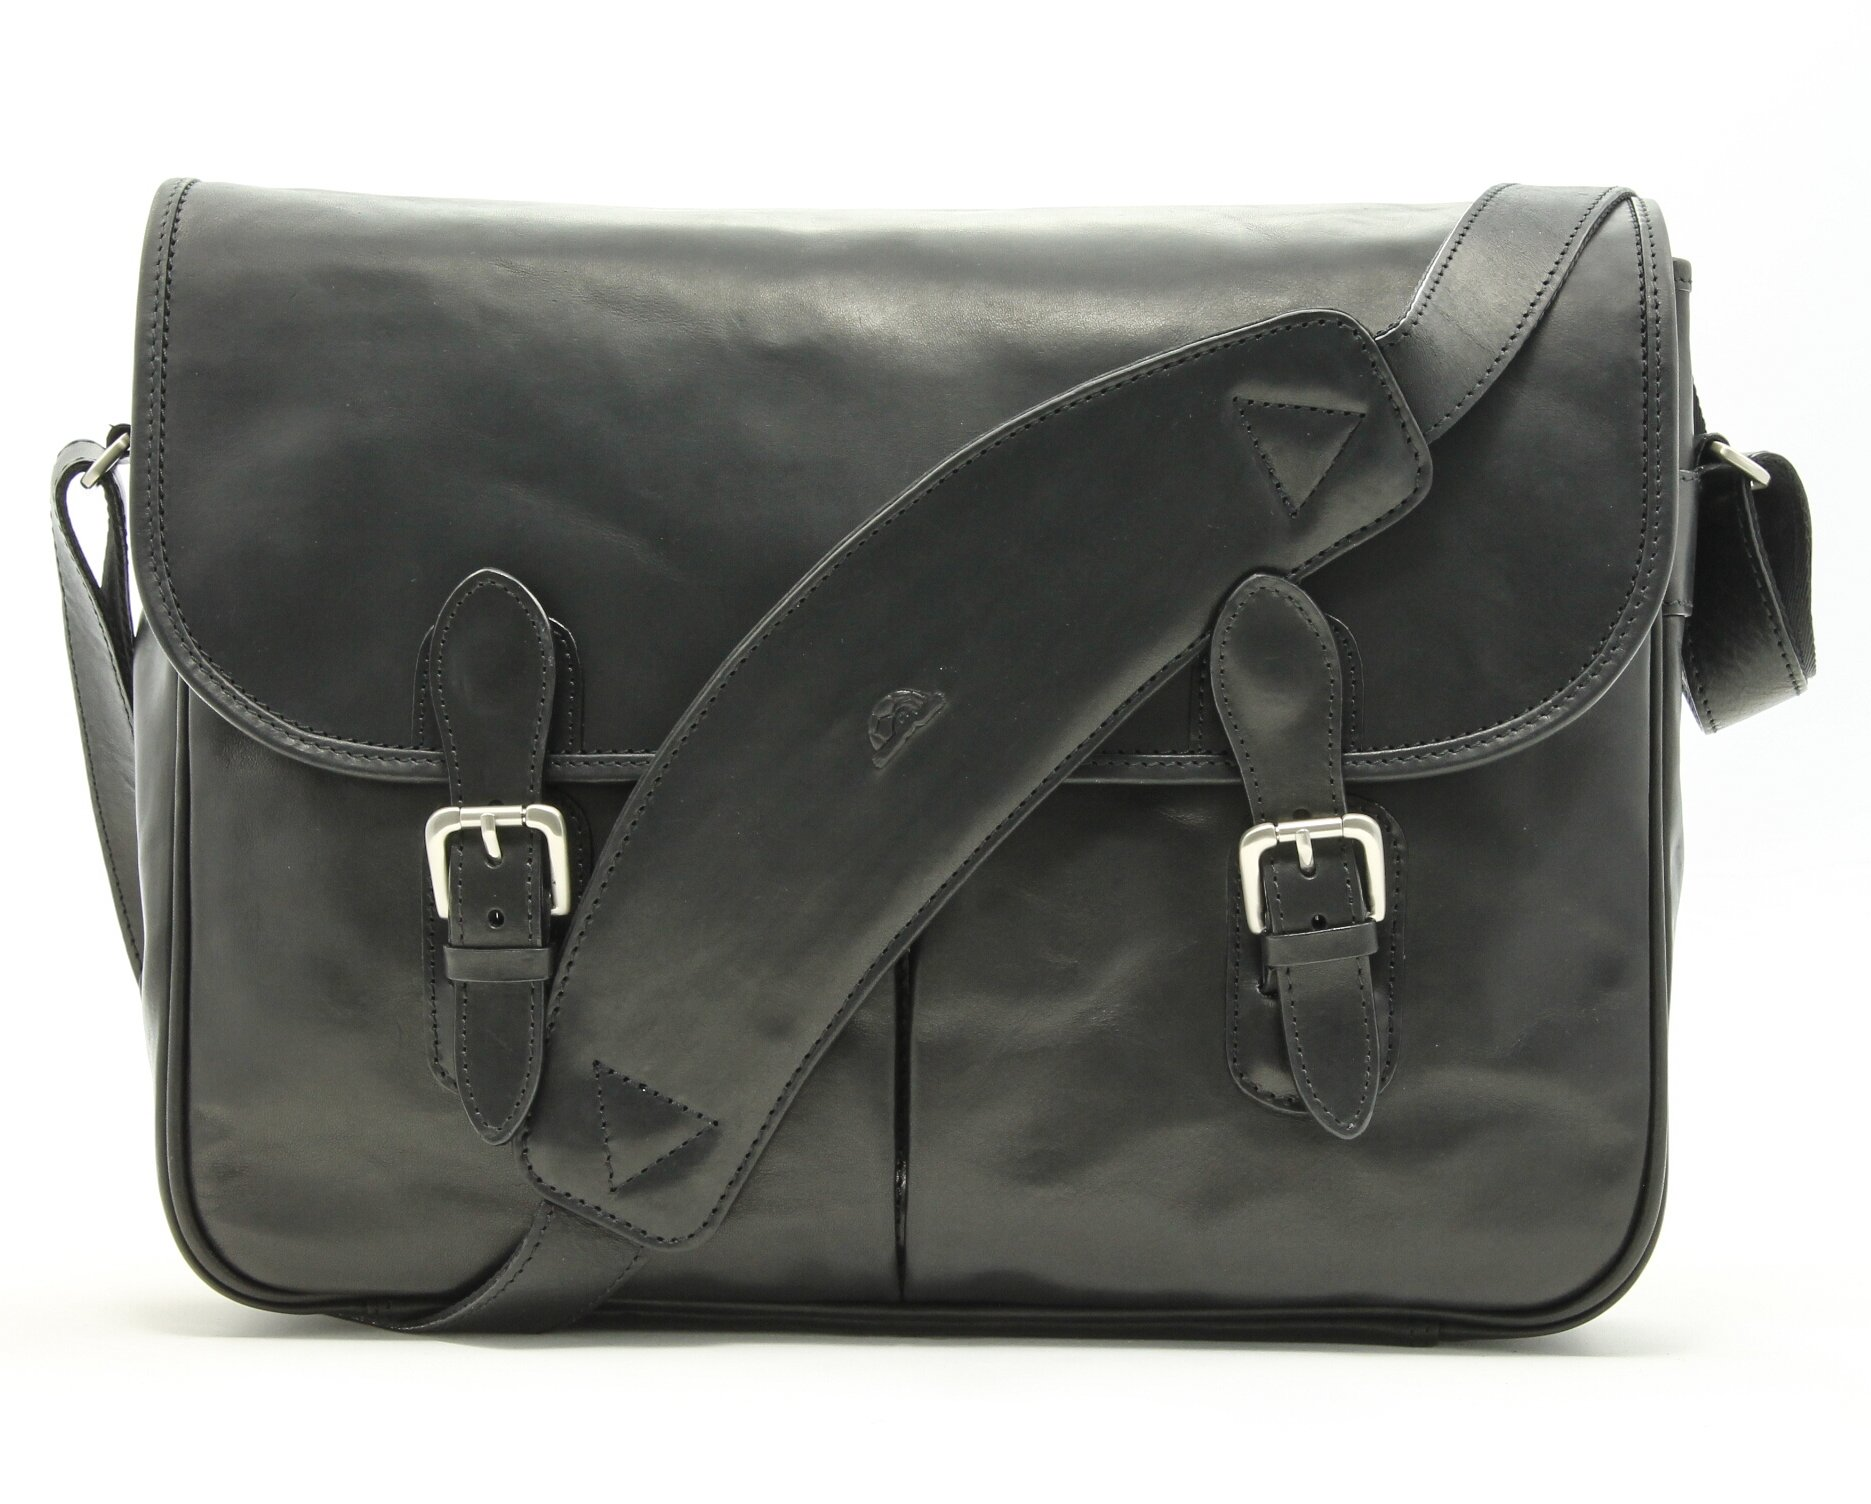 Tony Perotti Italian Leather Lorenzo 15.6'' Laptop Briefcase Messenger Shoulder Bag, Black, One Size by Tony Perotti